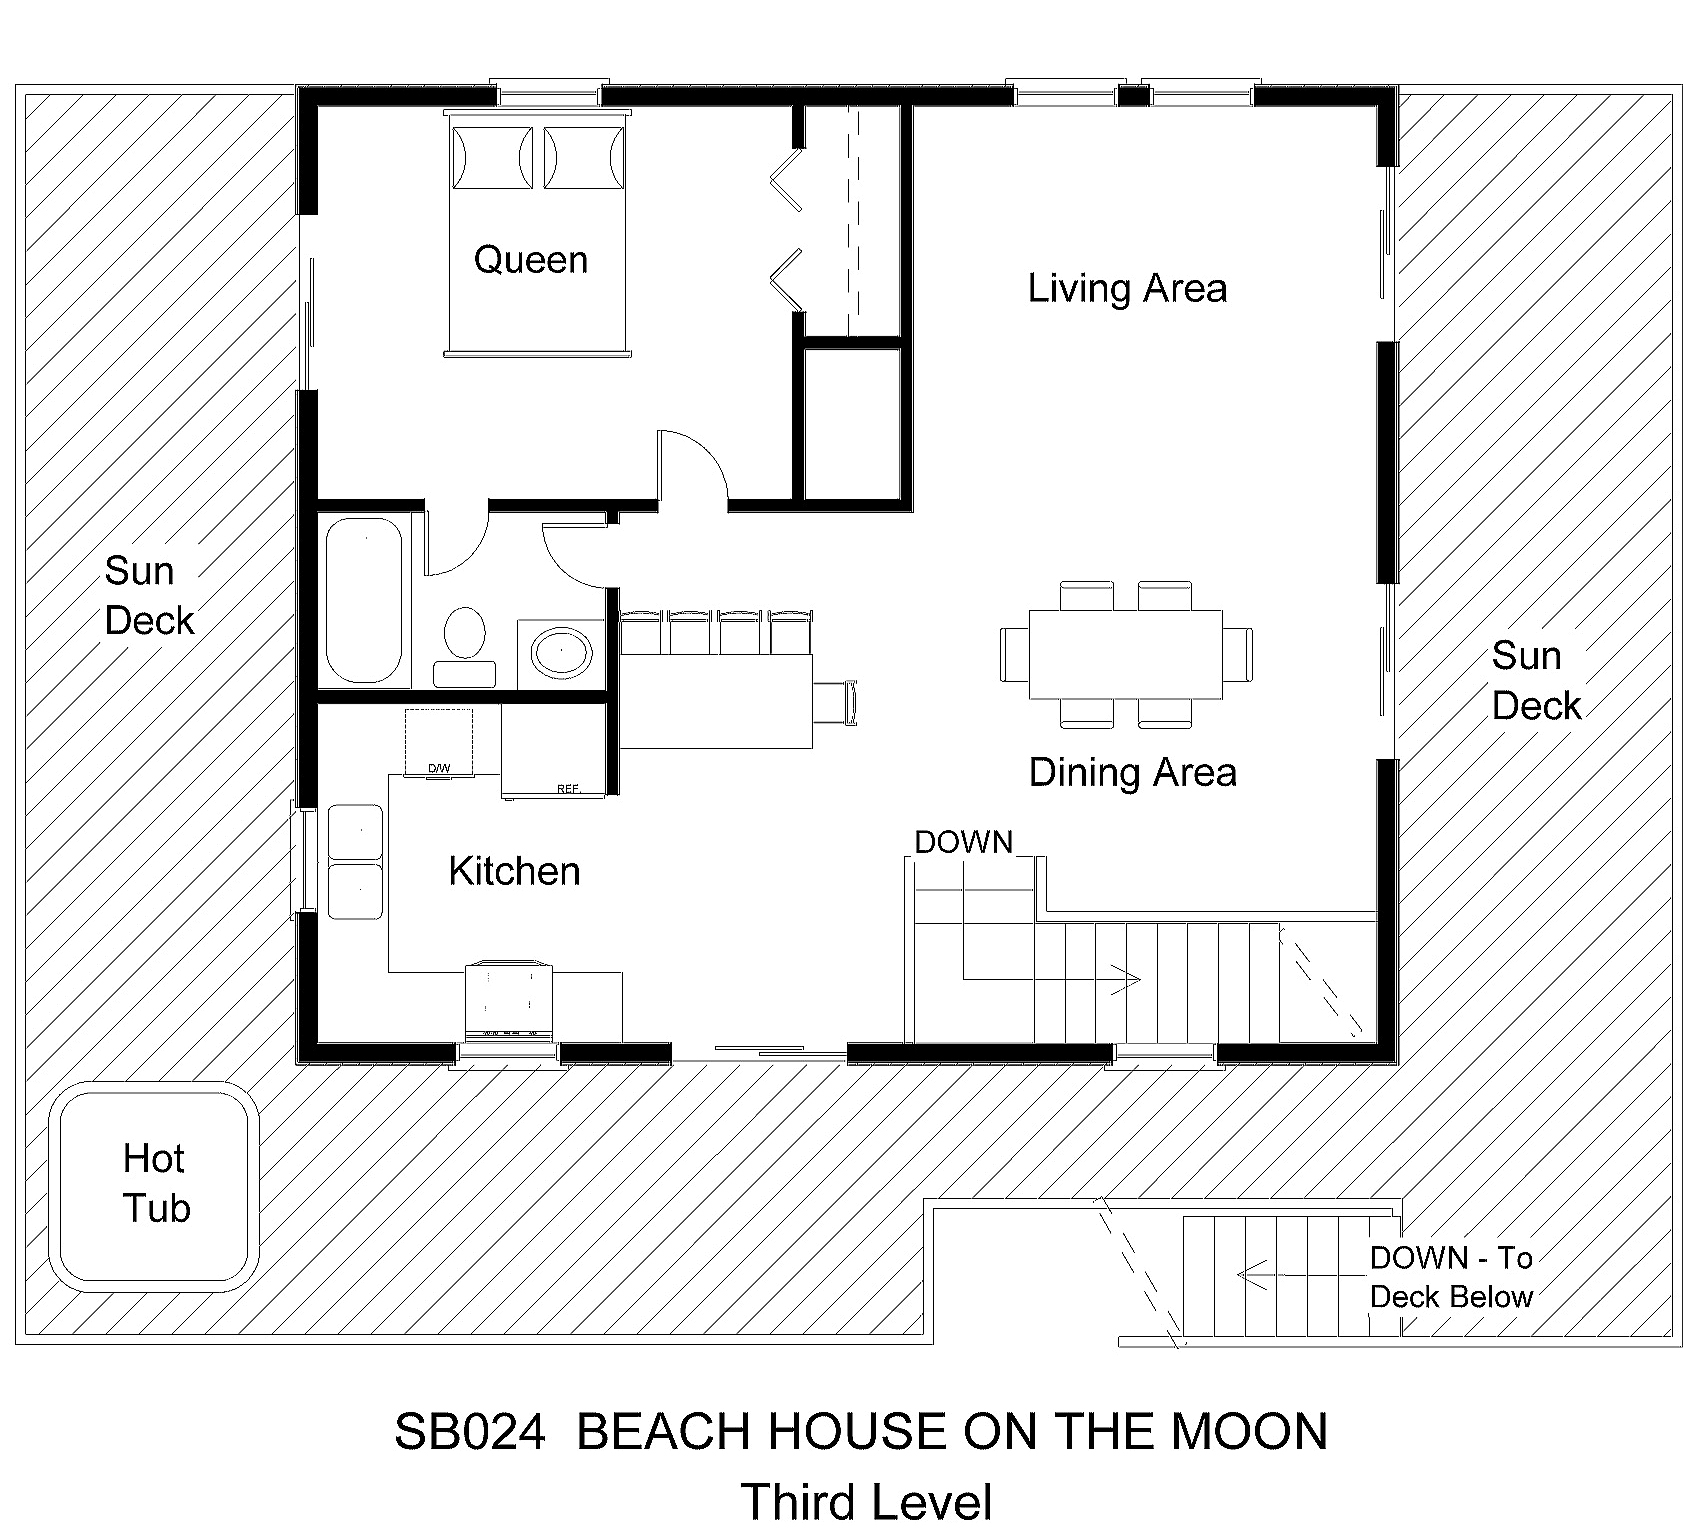 Sb024 Beach House On The Moon Floor Plan Level 3 0 Jpg Midgett